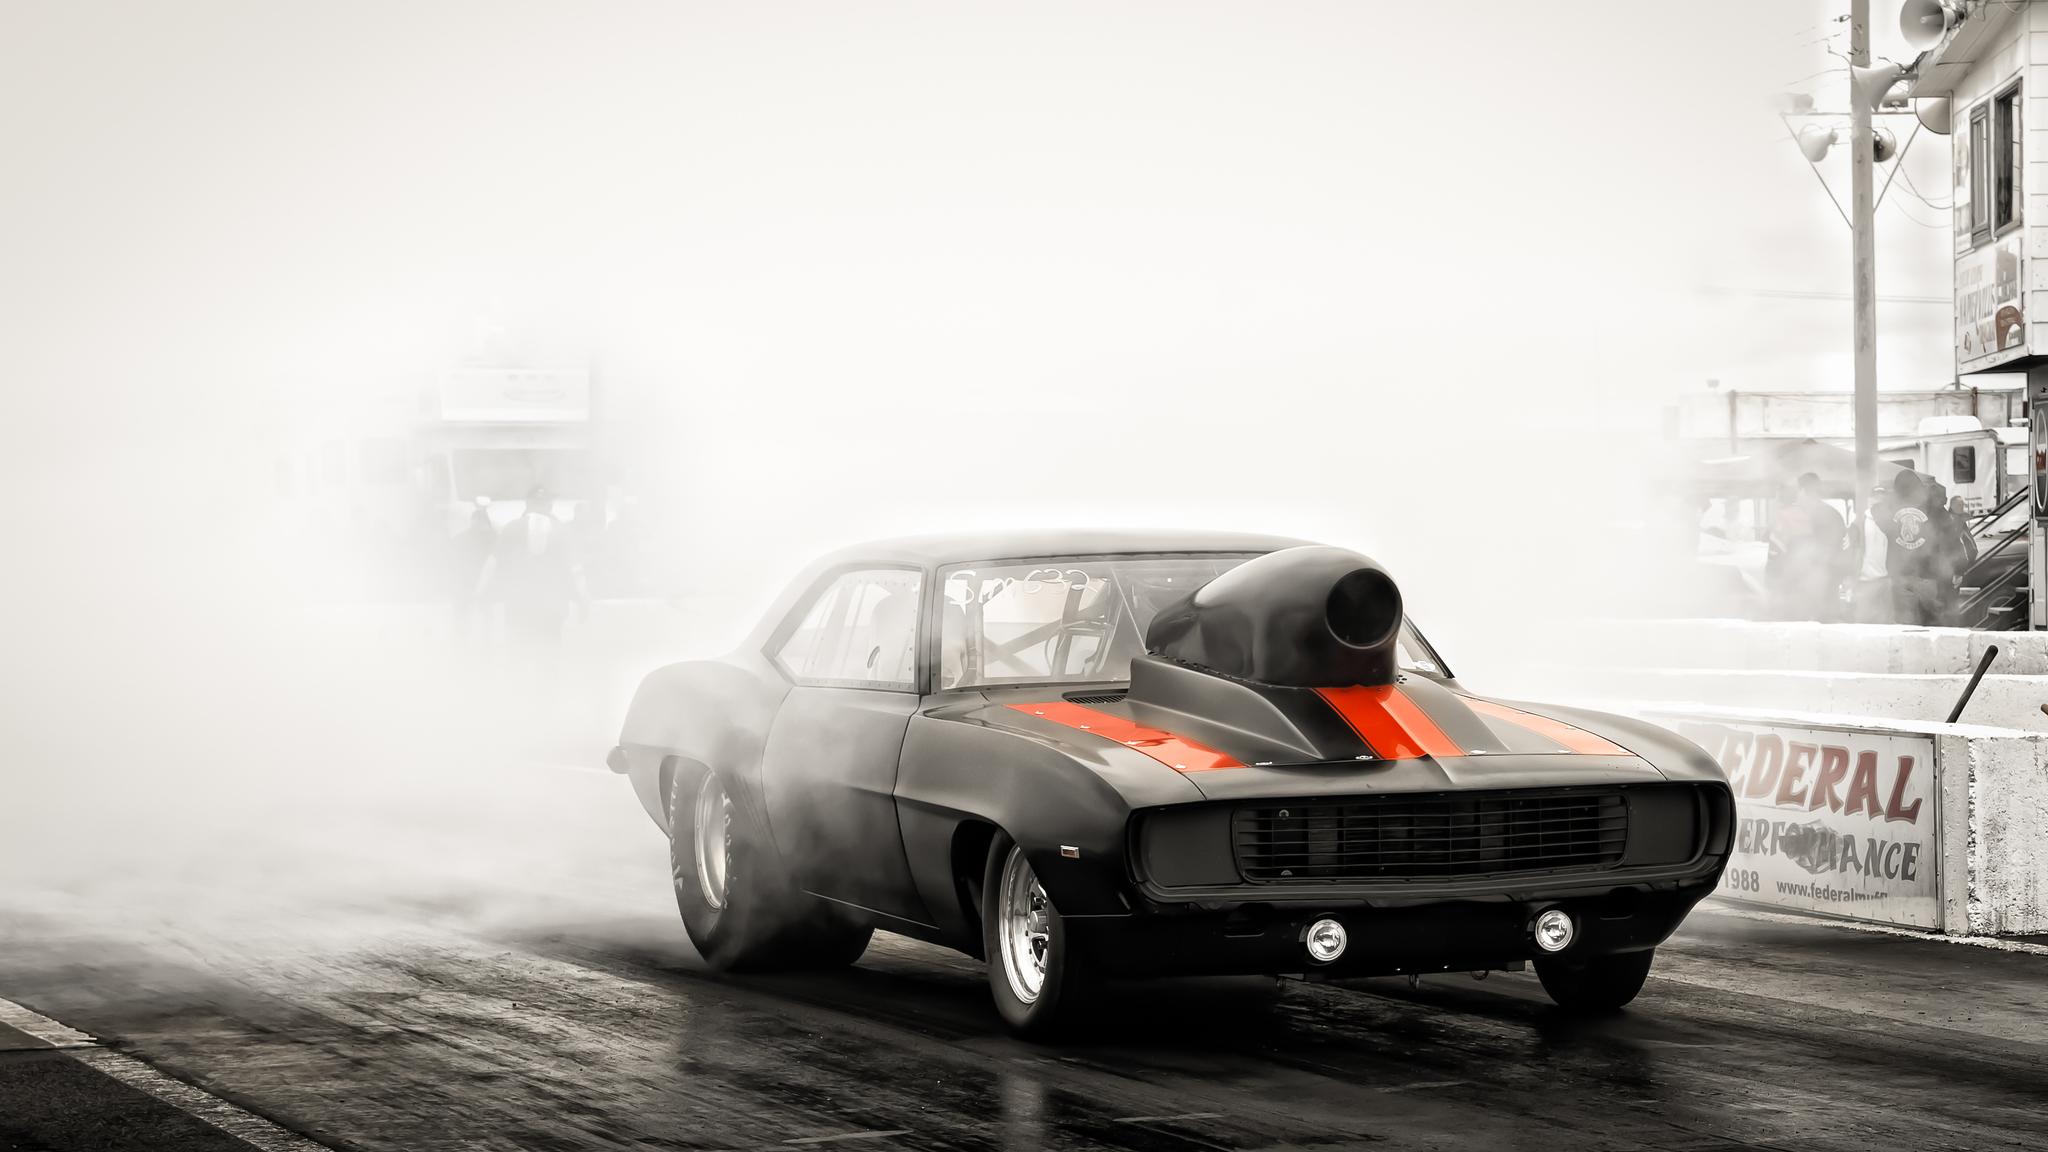 2048x1152 drag racing car 2048x1152 resolution hd 4k - Car racing wallpaper free download ...